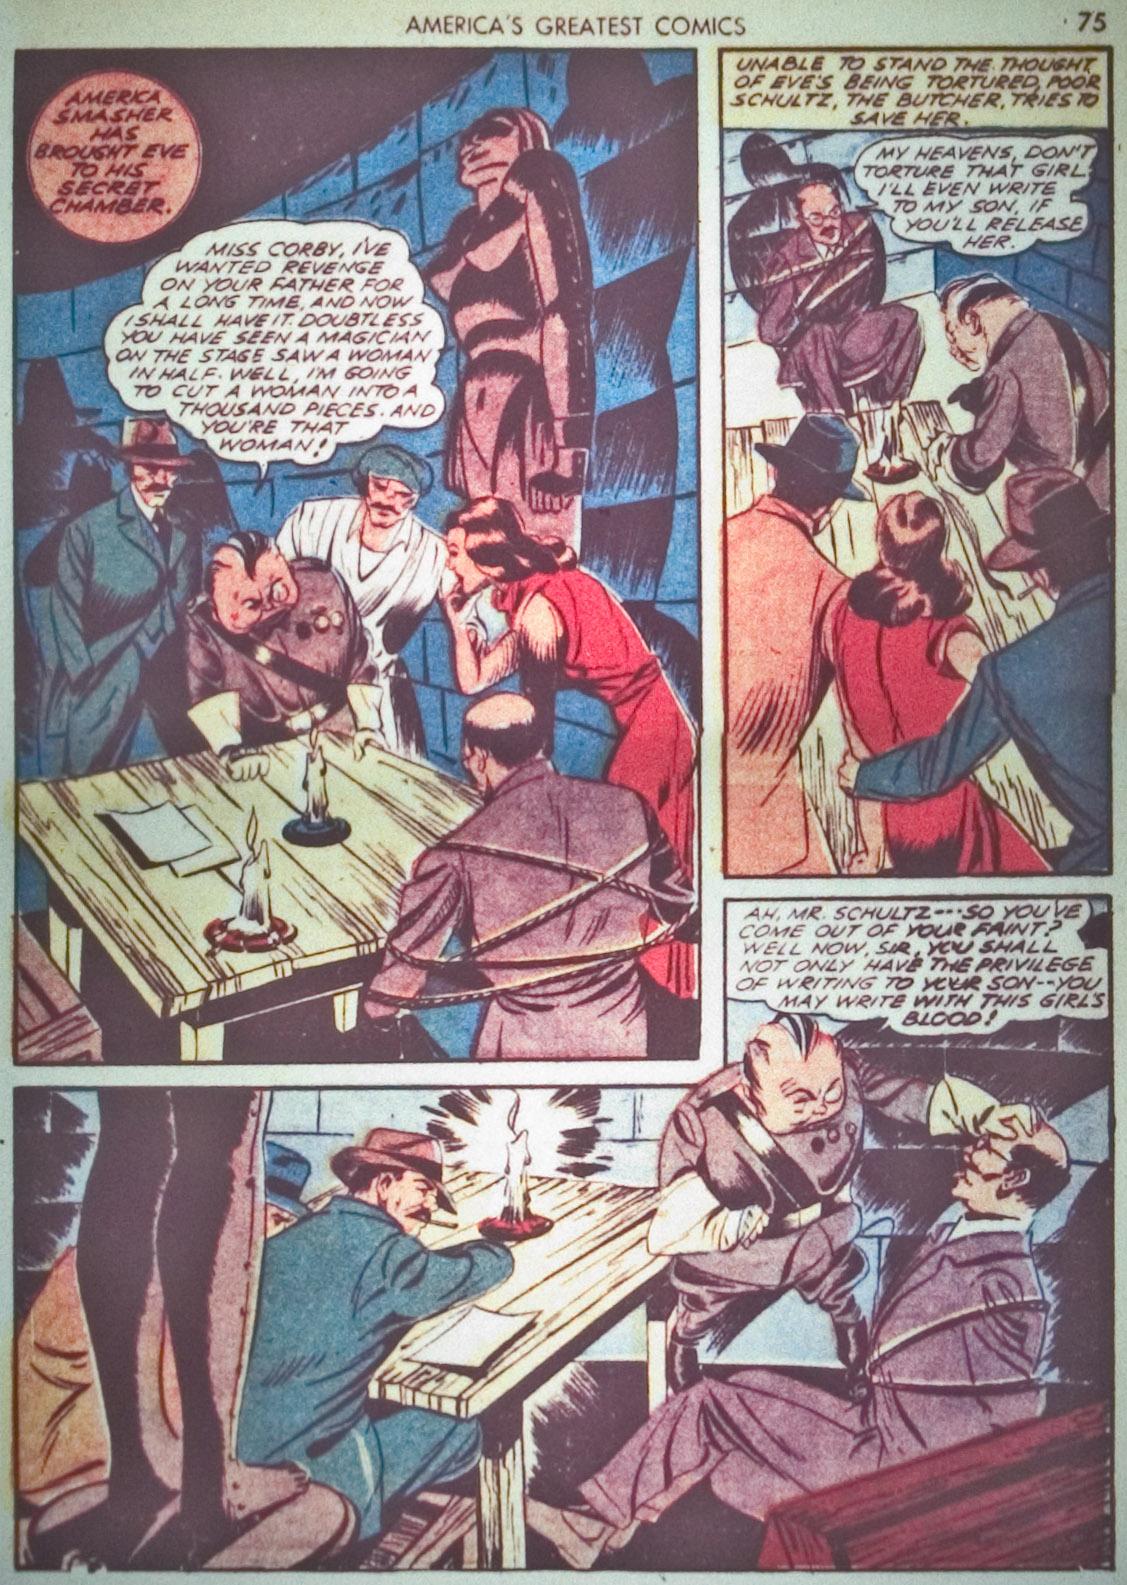 Read online America's Greatest Comics comic -  Issue #1 - 78